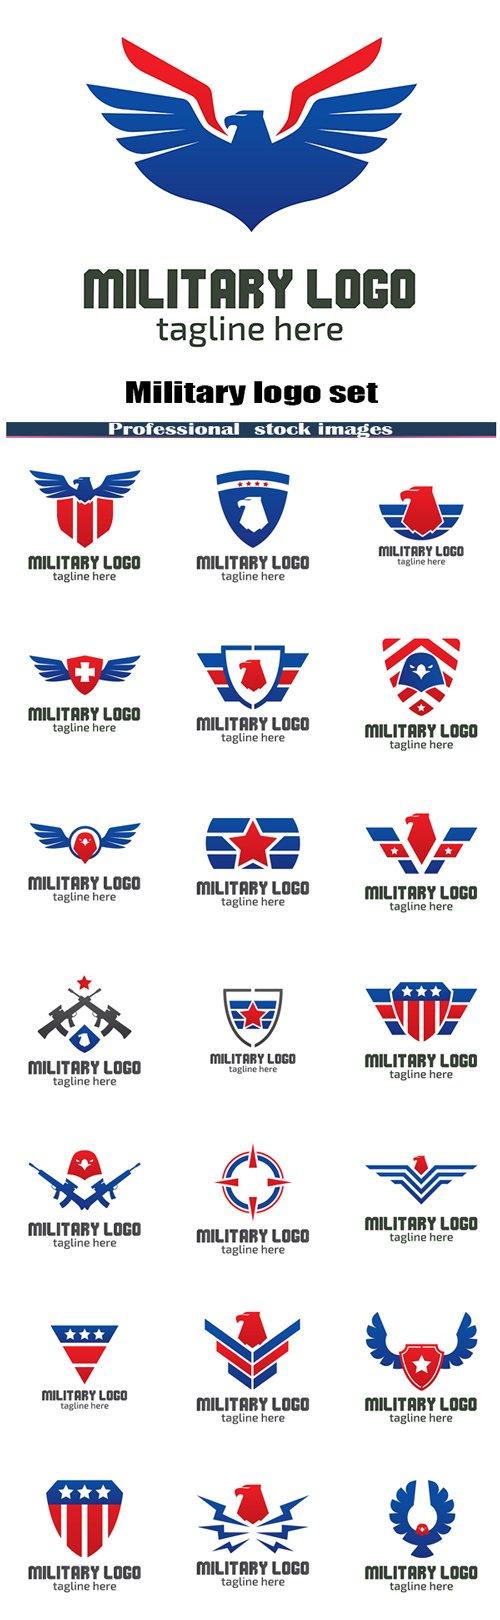 Military logo set